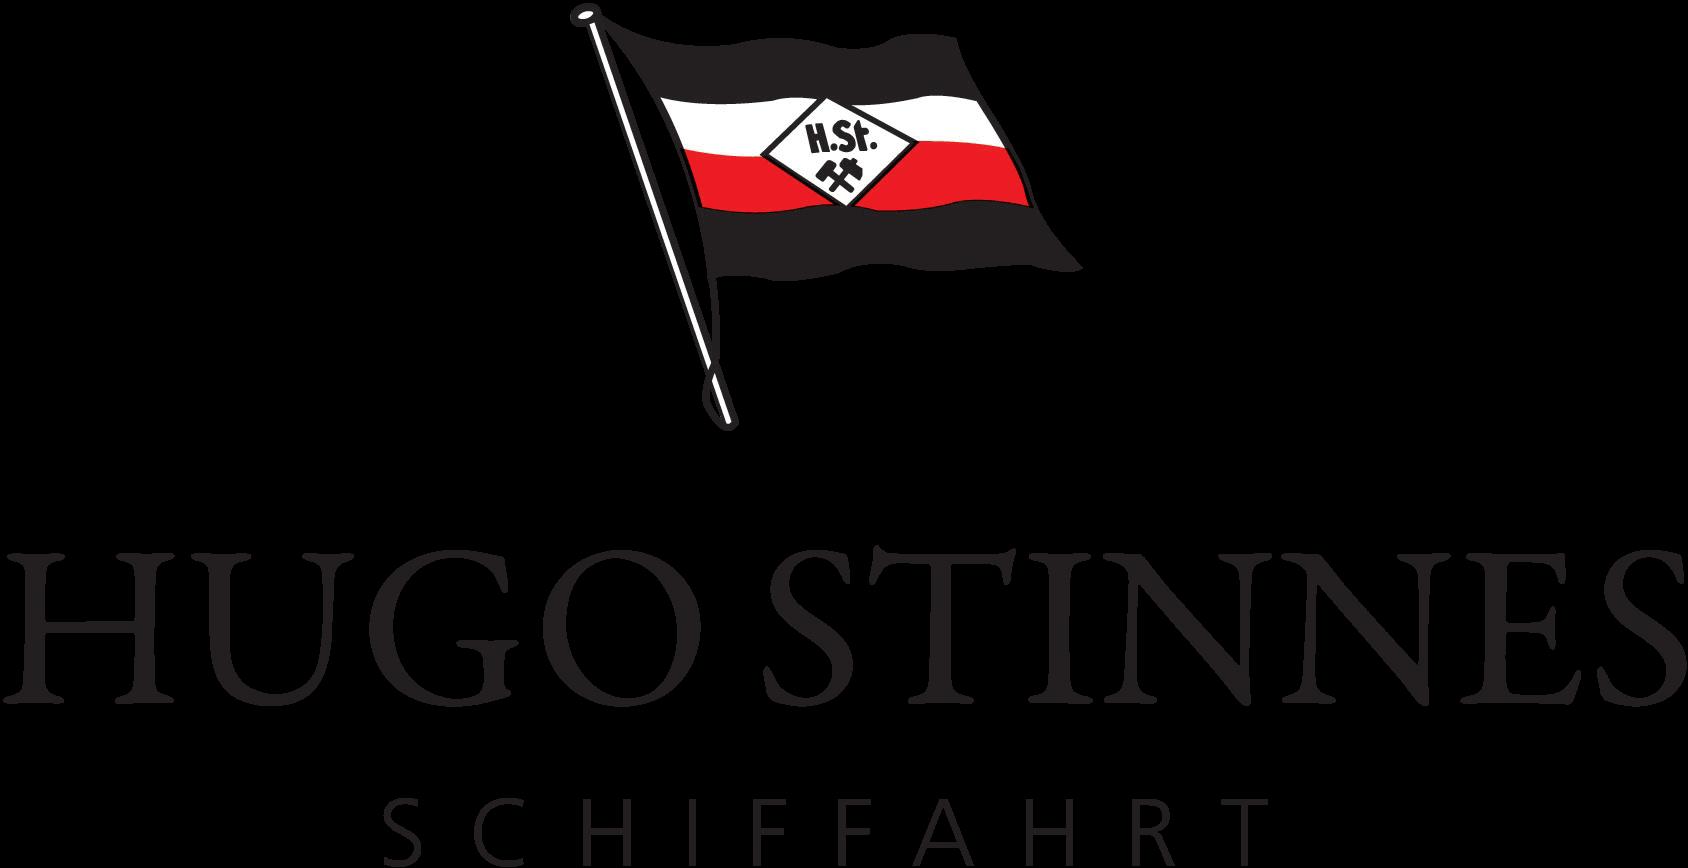 Hugo Stinnes Schiffahrt